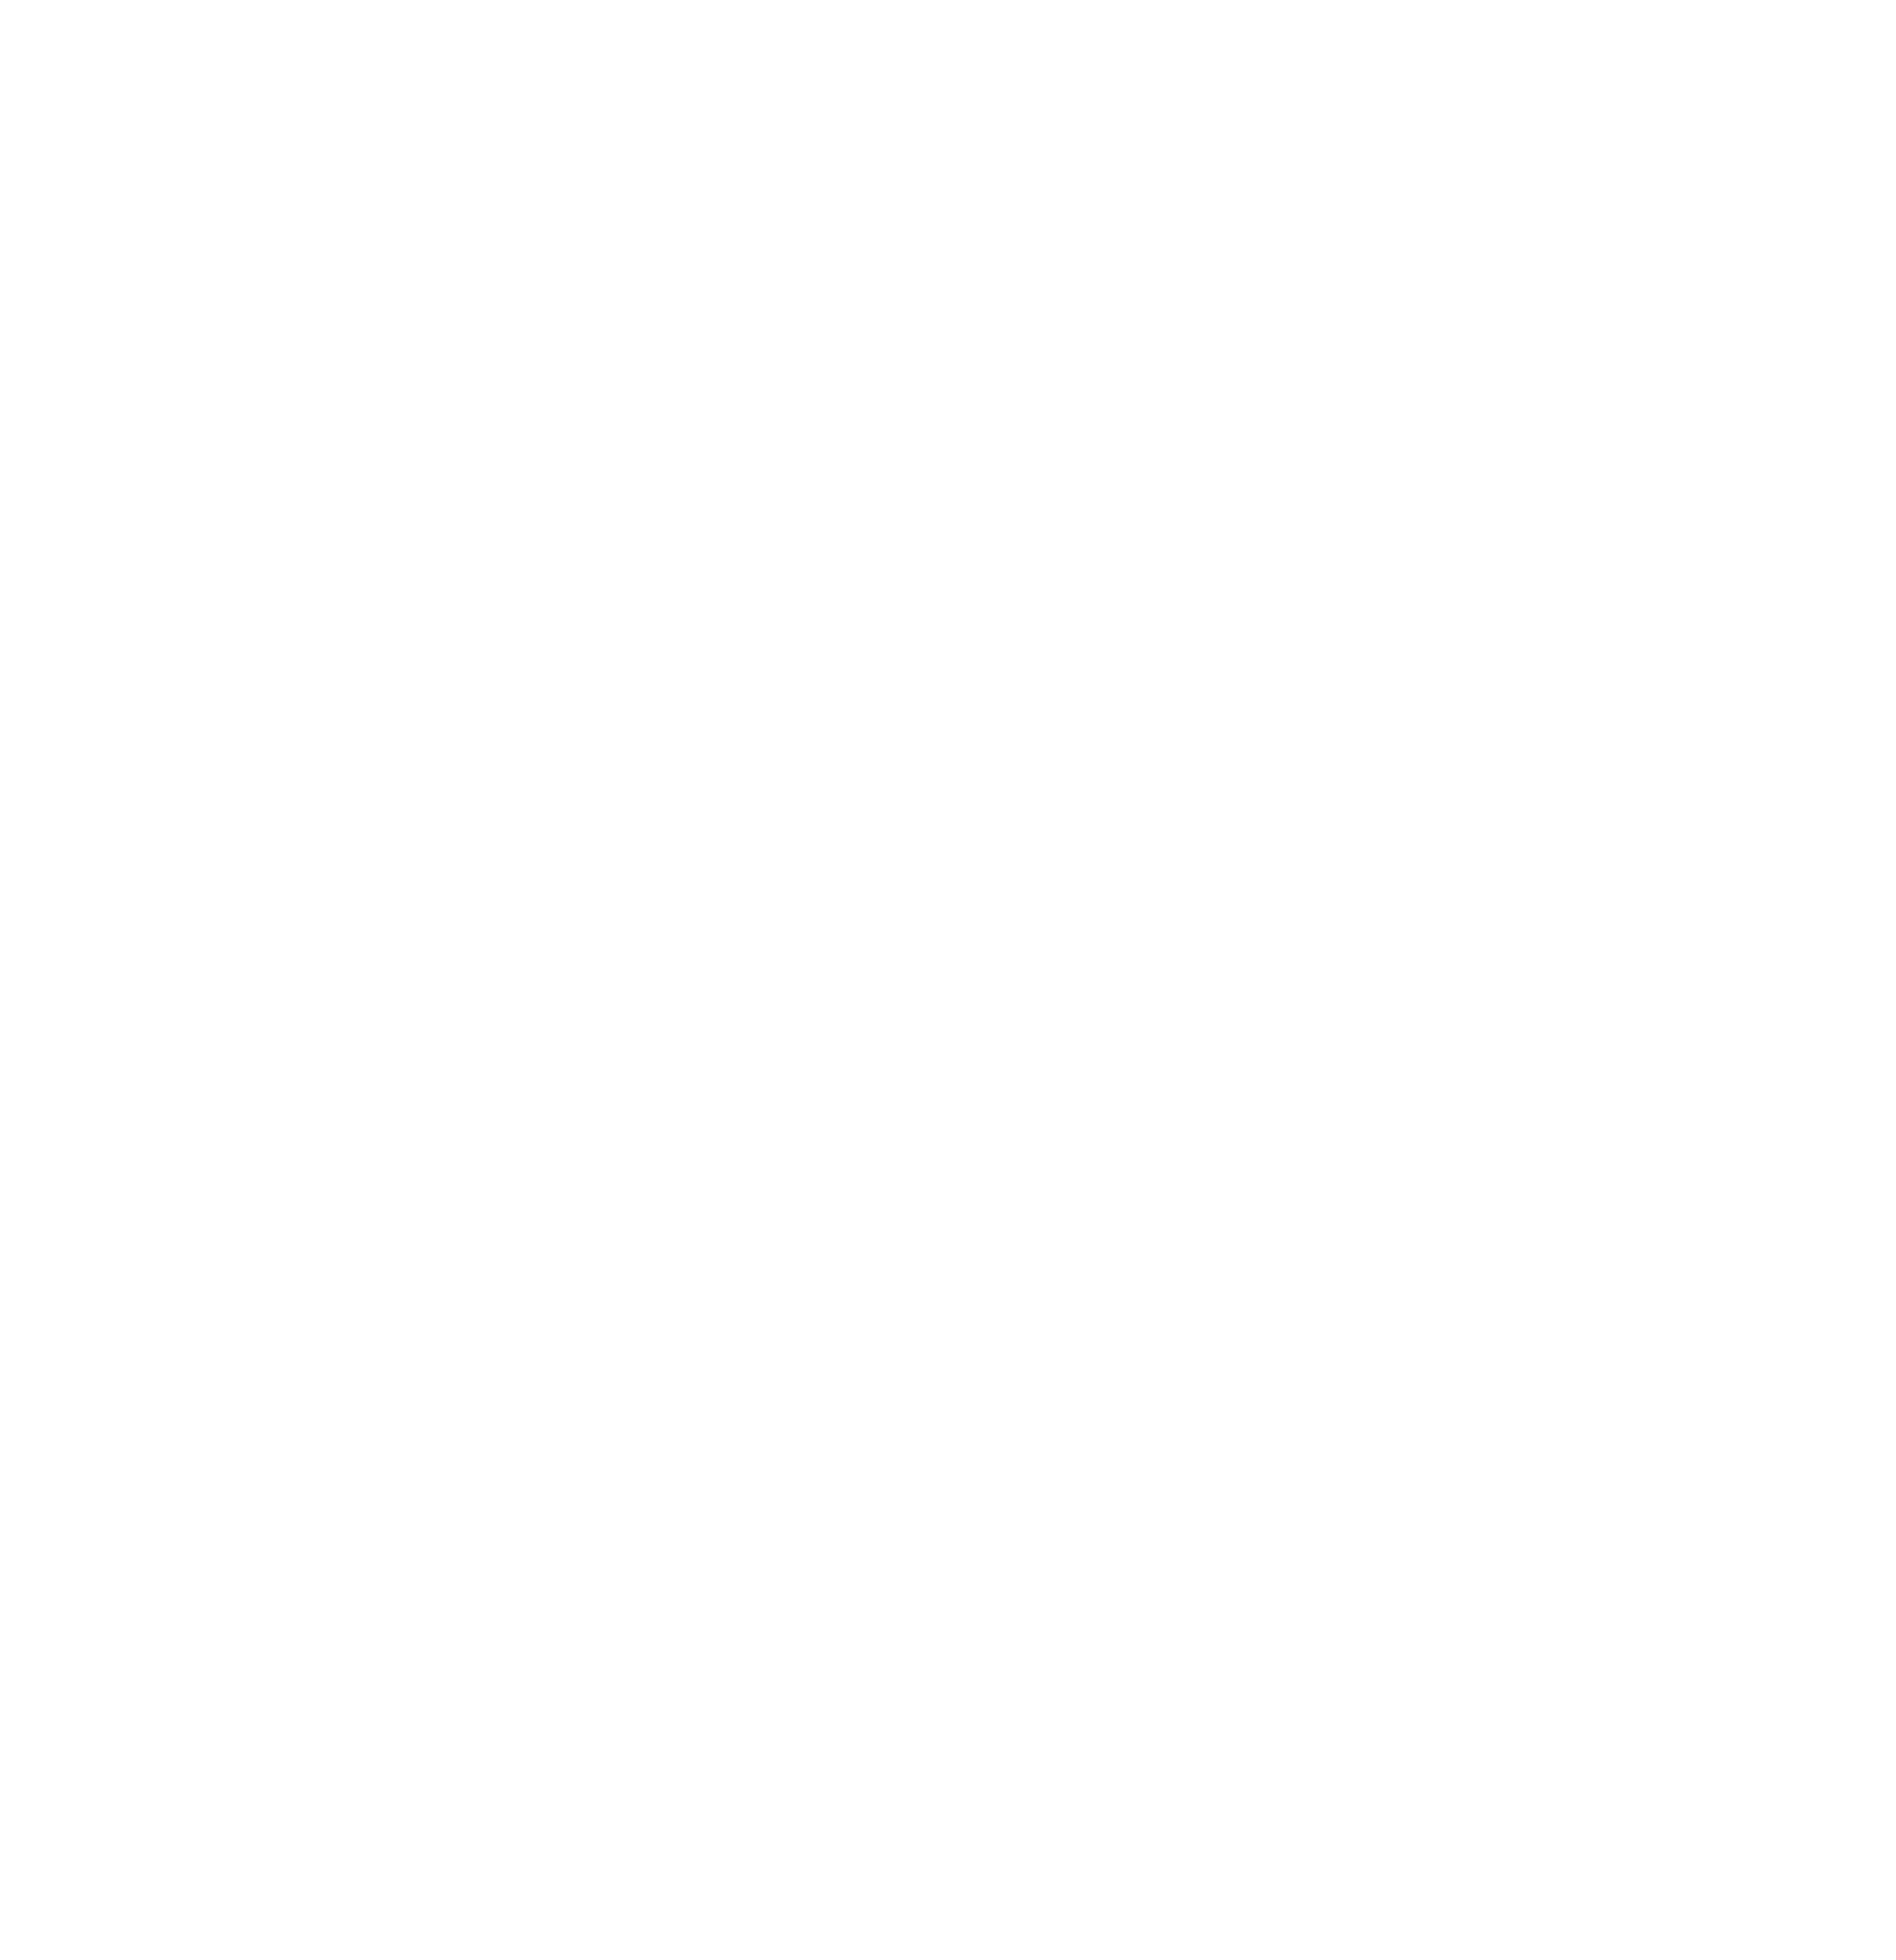 UFCAT - Identidade Visual_Símbolo - branco